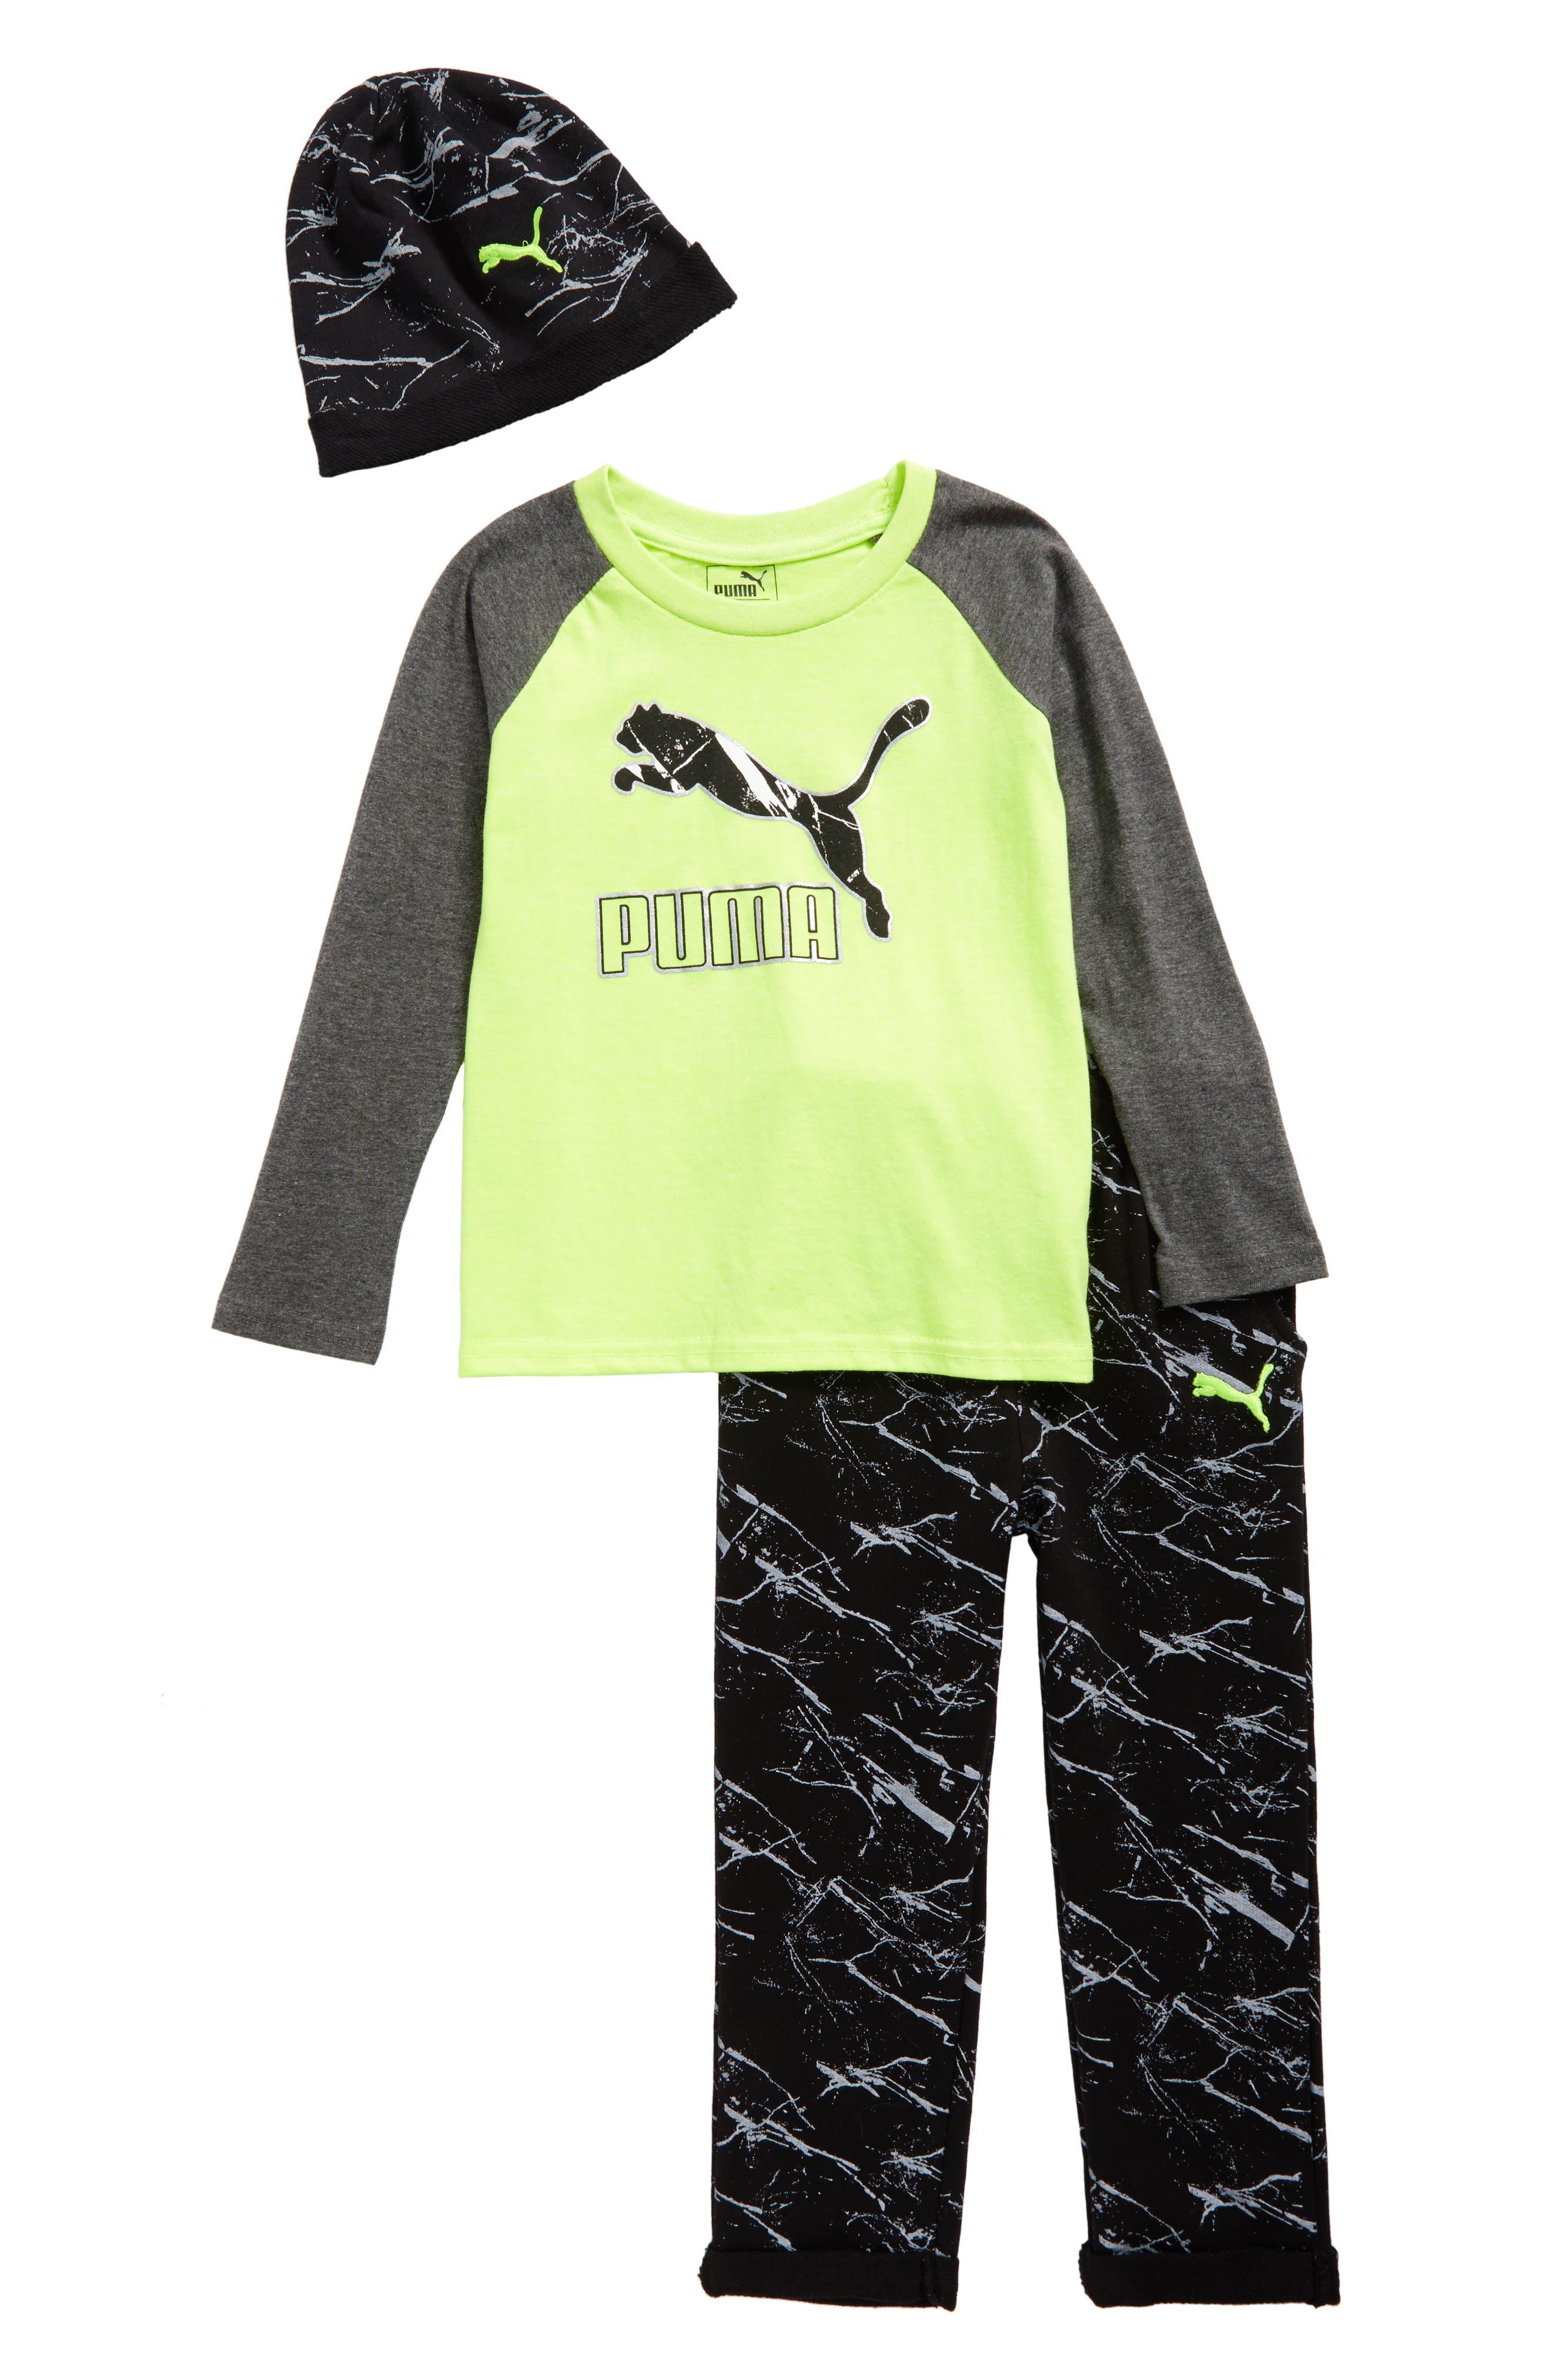 Main Image - PUMA Hat, T-Shirt & Sweatpants Set (Toddler Boys & Little Boys)